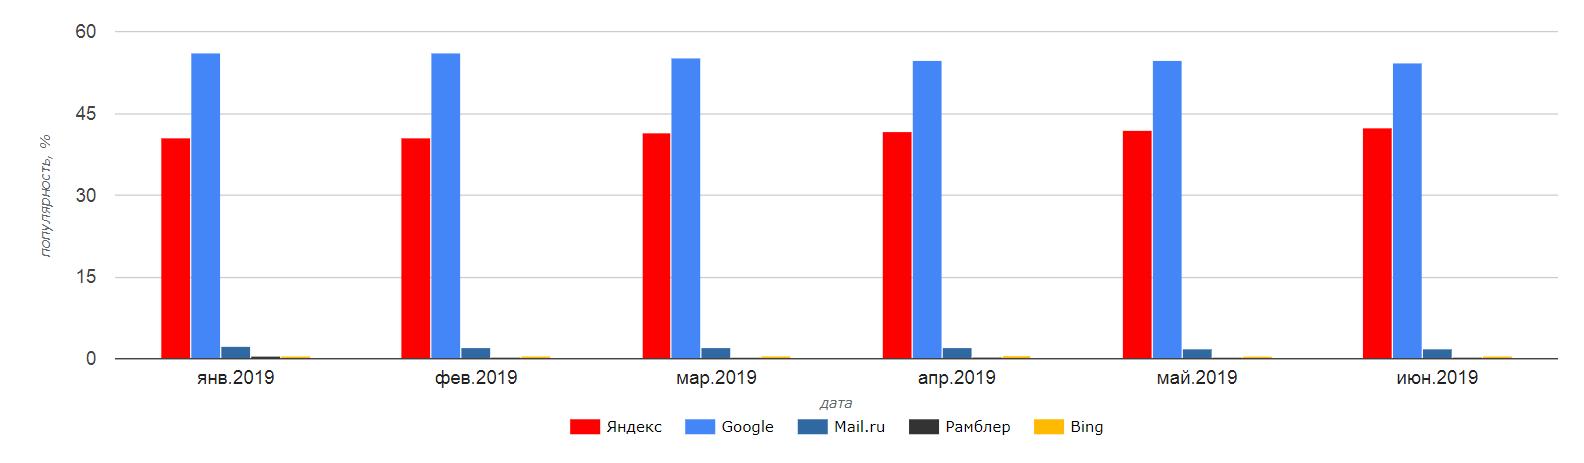 Статистика SEO Auditor за 2019